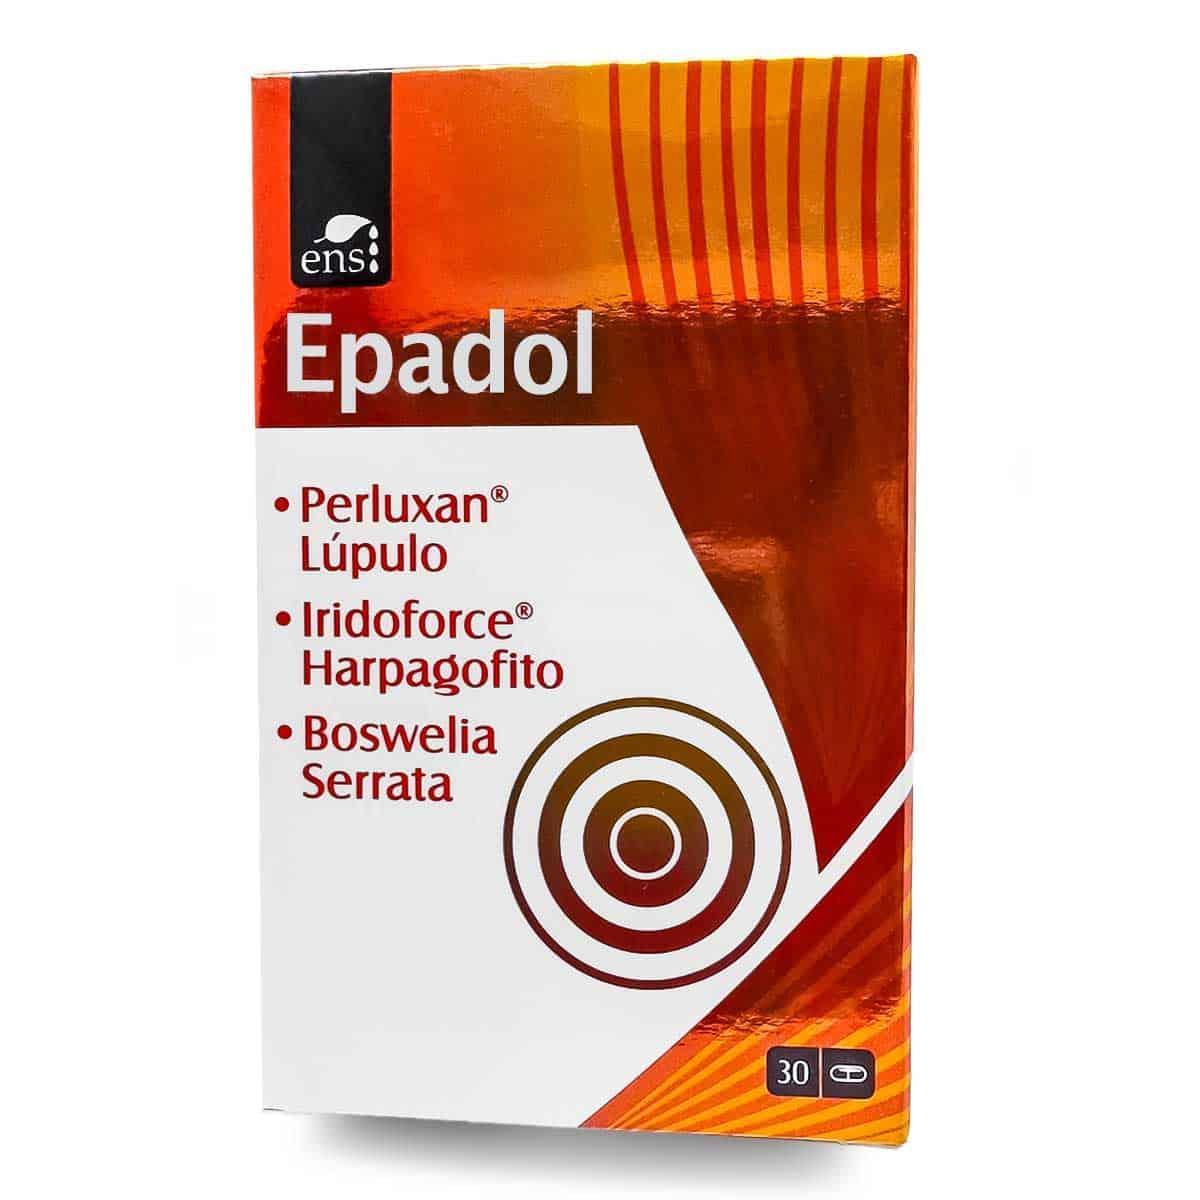 Epadol ENS 30 caps